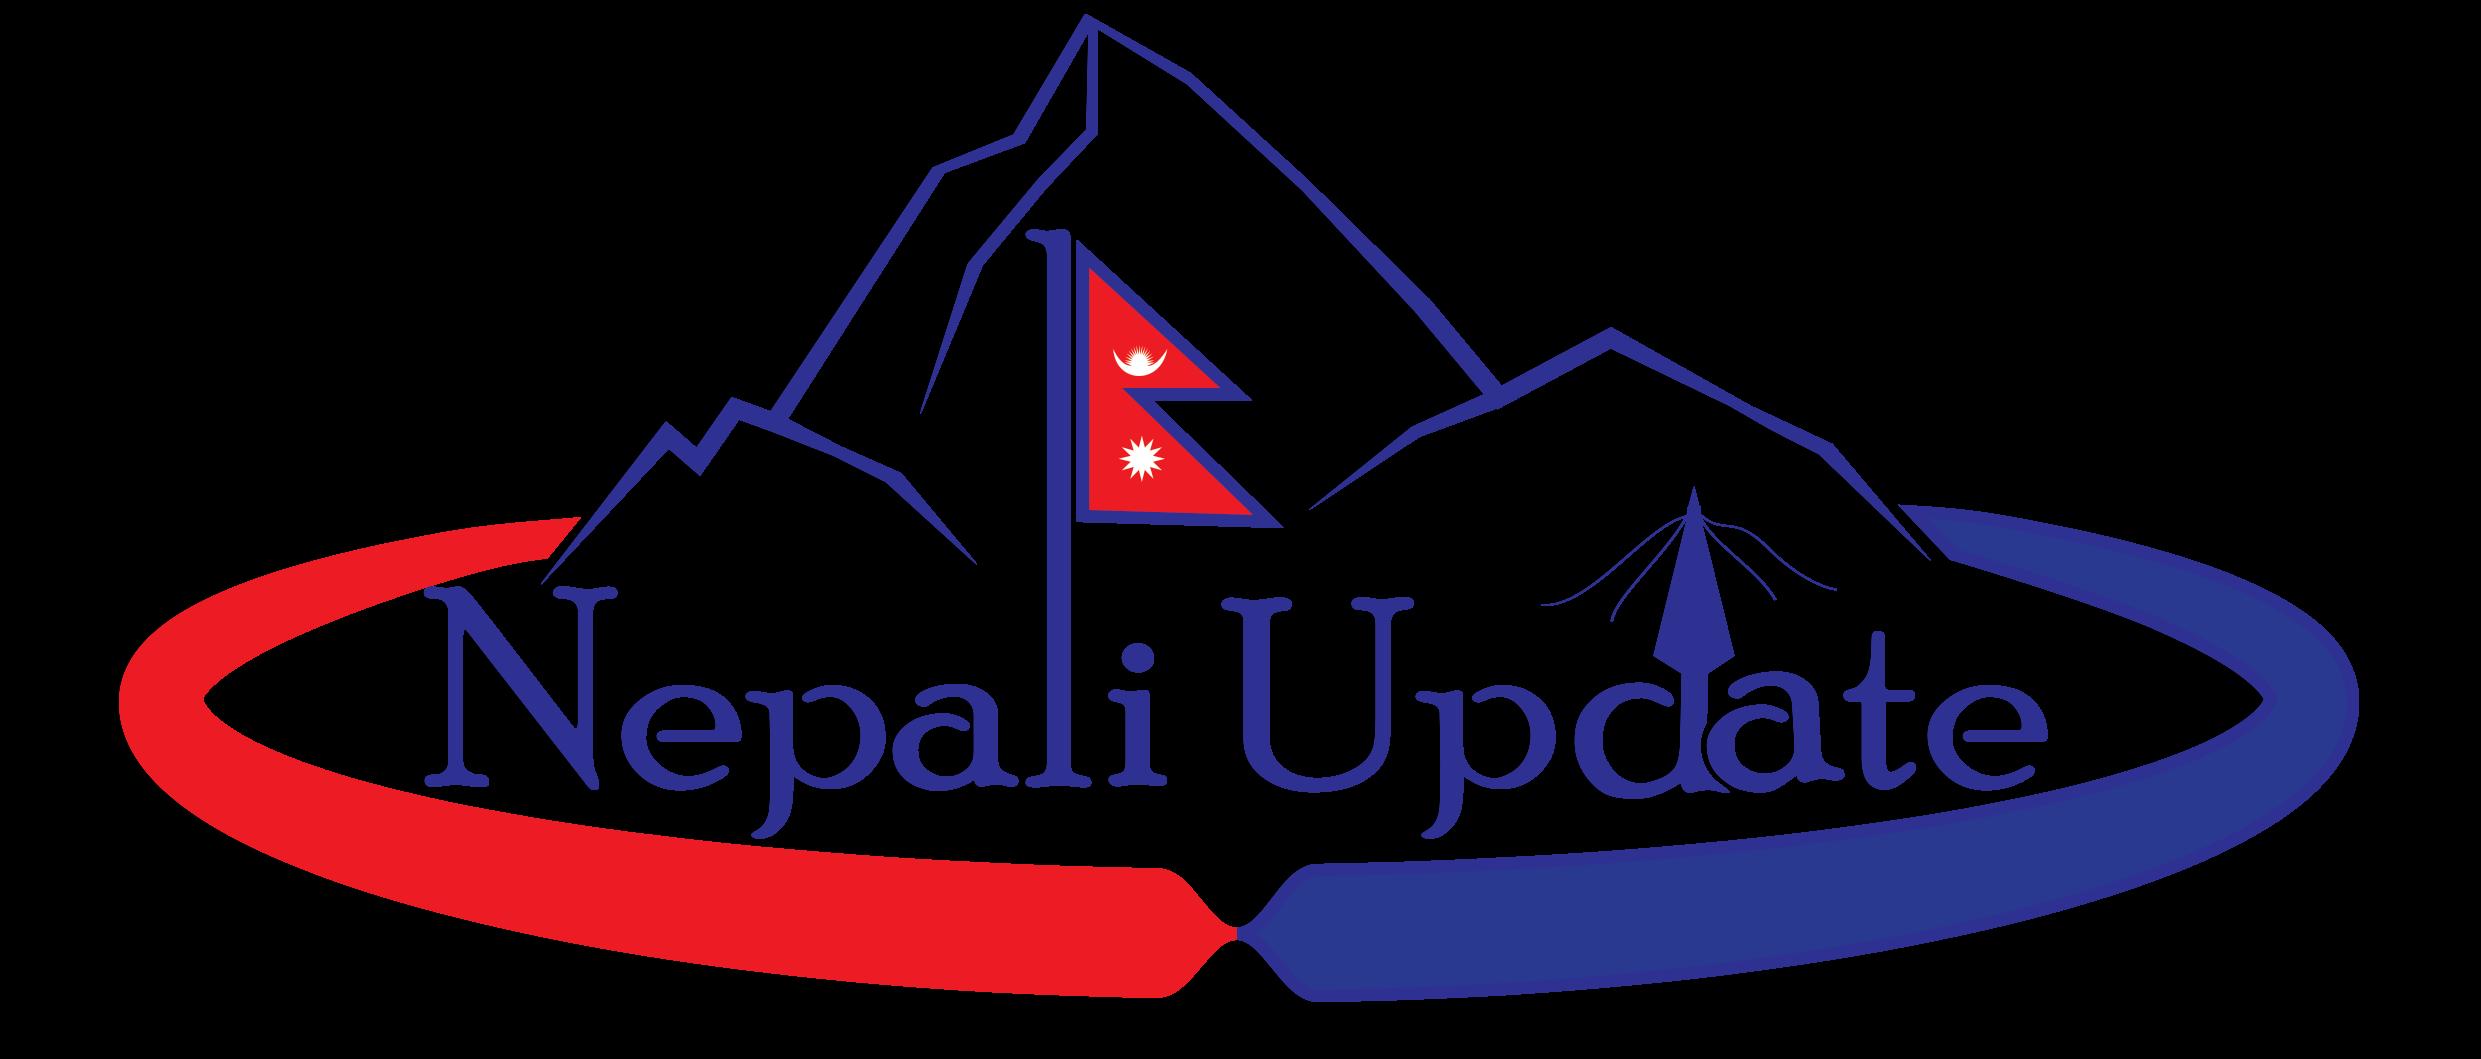 Nepali Update